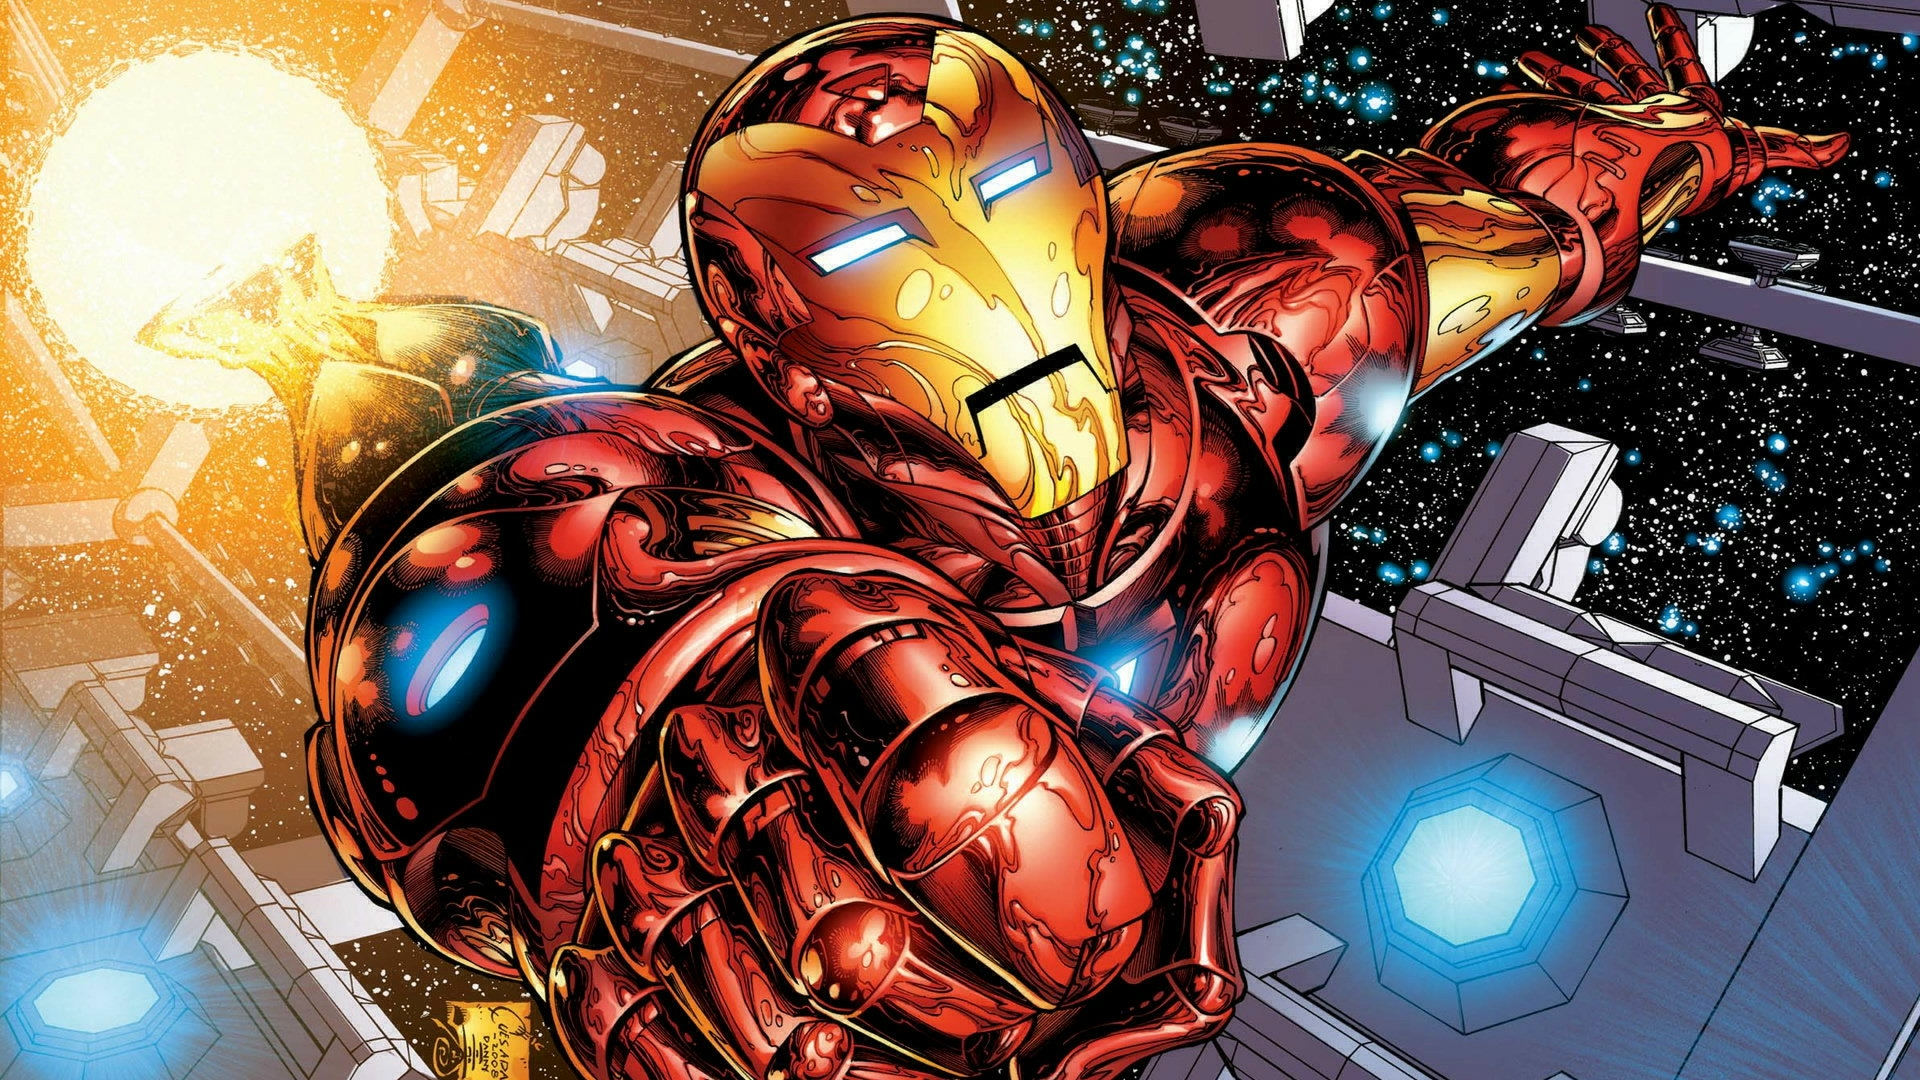 50 iron man screensavers and wallpaper on wallpapersafari - Iron man cartoon hd ...